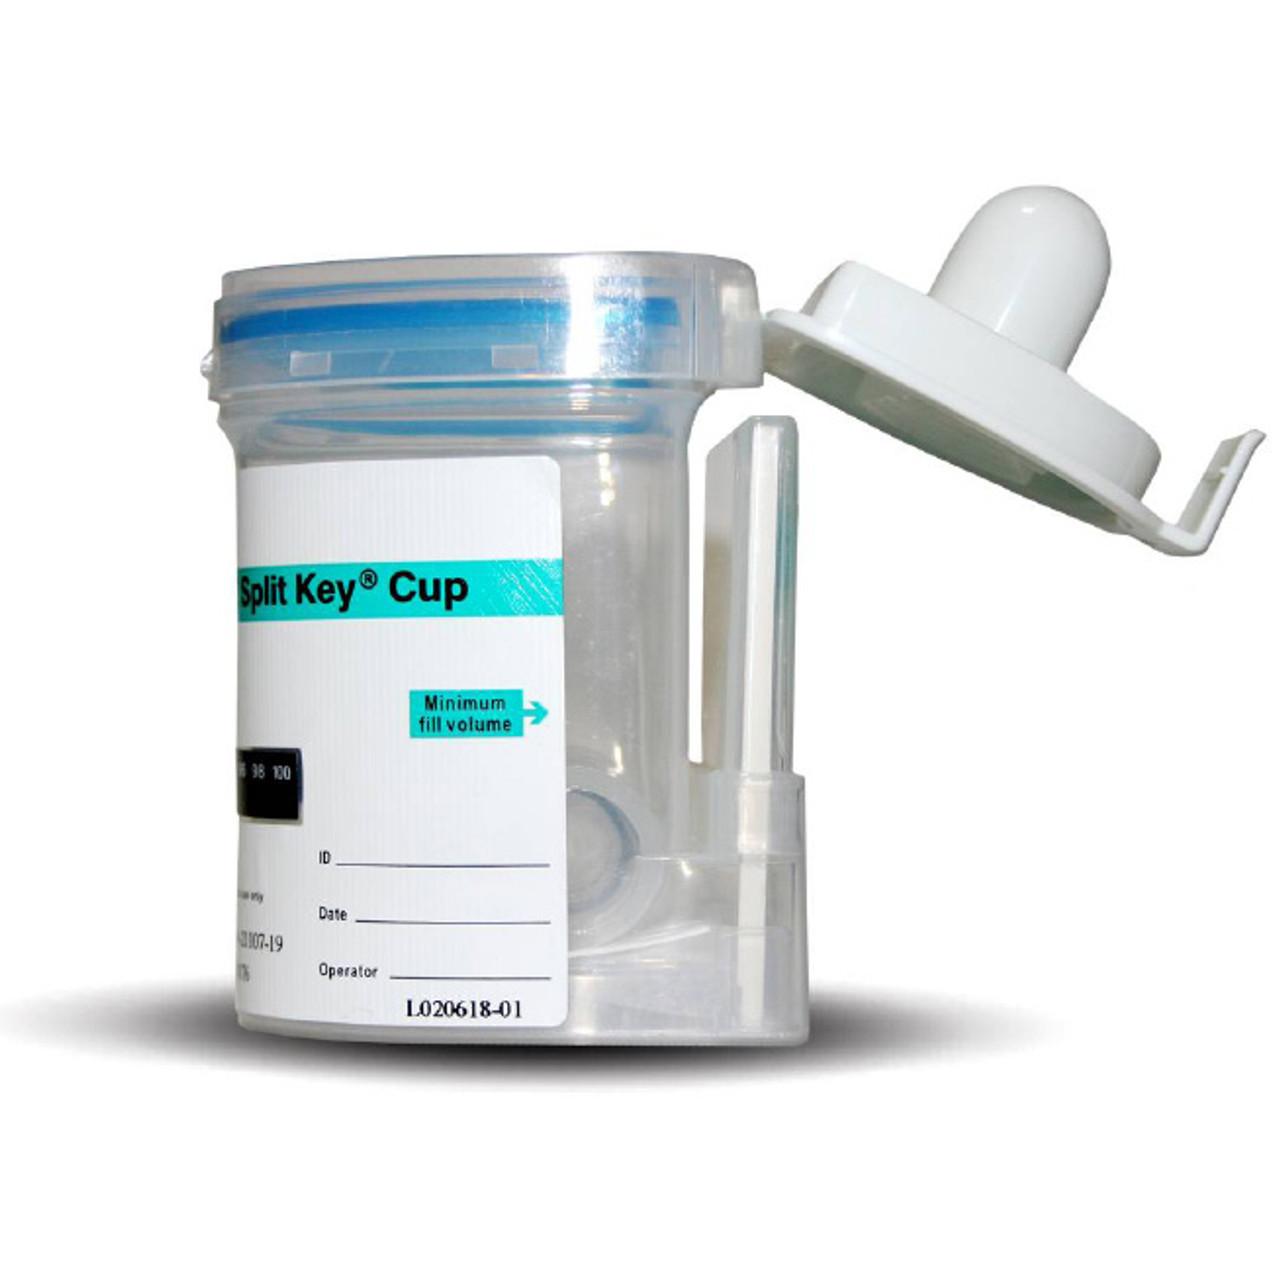 5 Panel E-Z Integrated Split Specimen Key Cup Drug Test CLIA Waived 25/Box